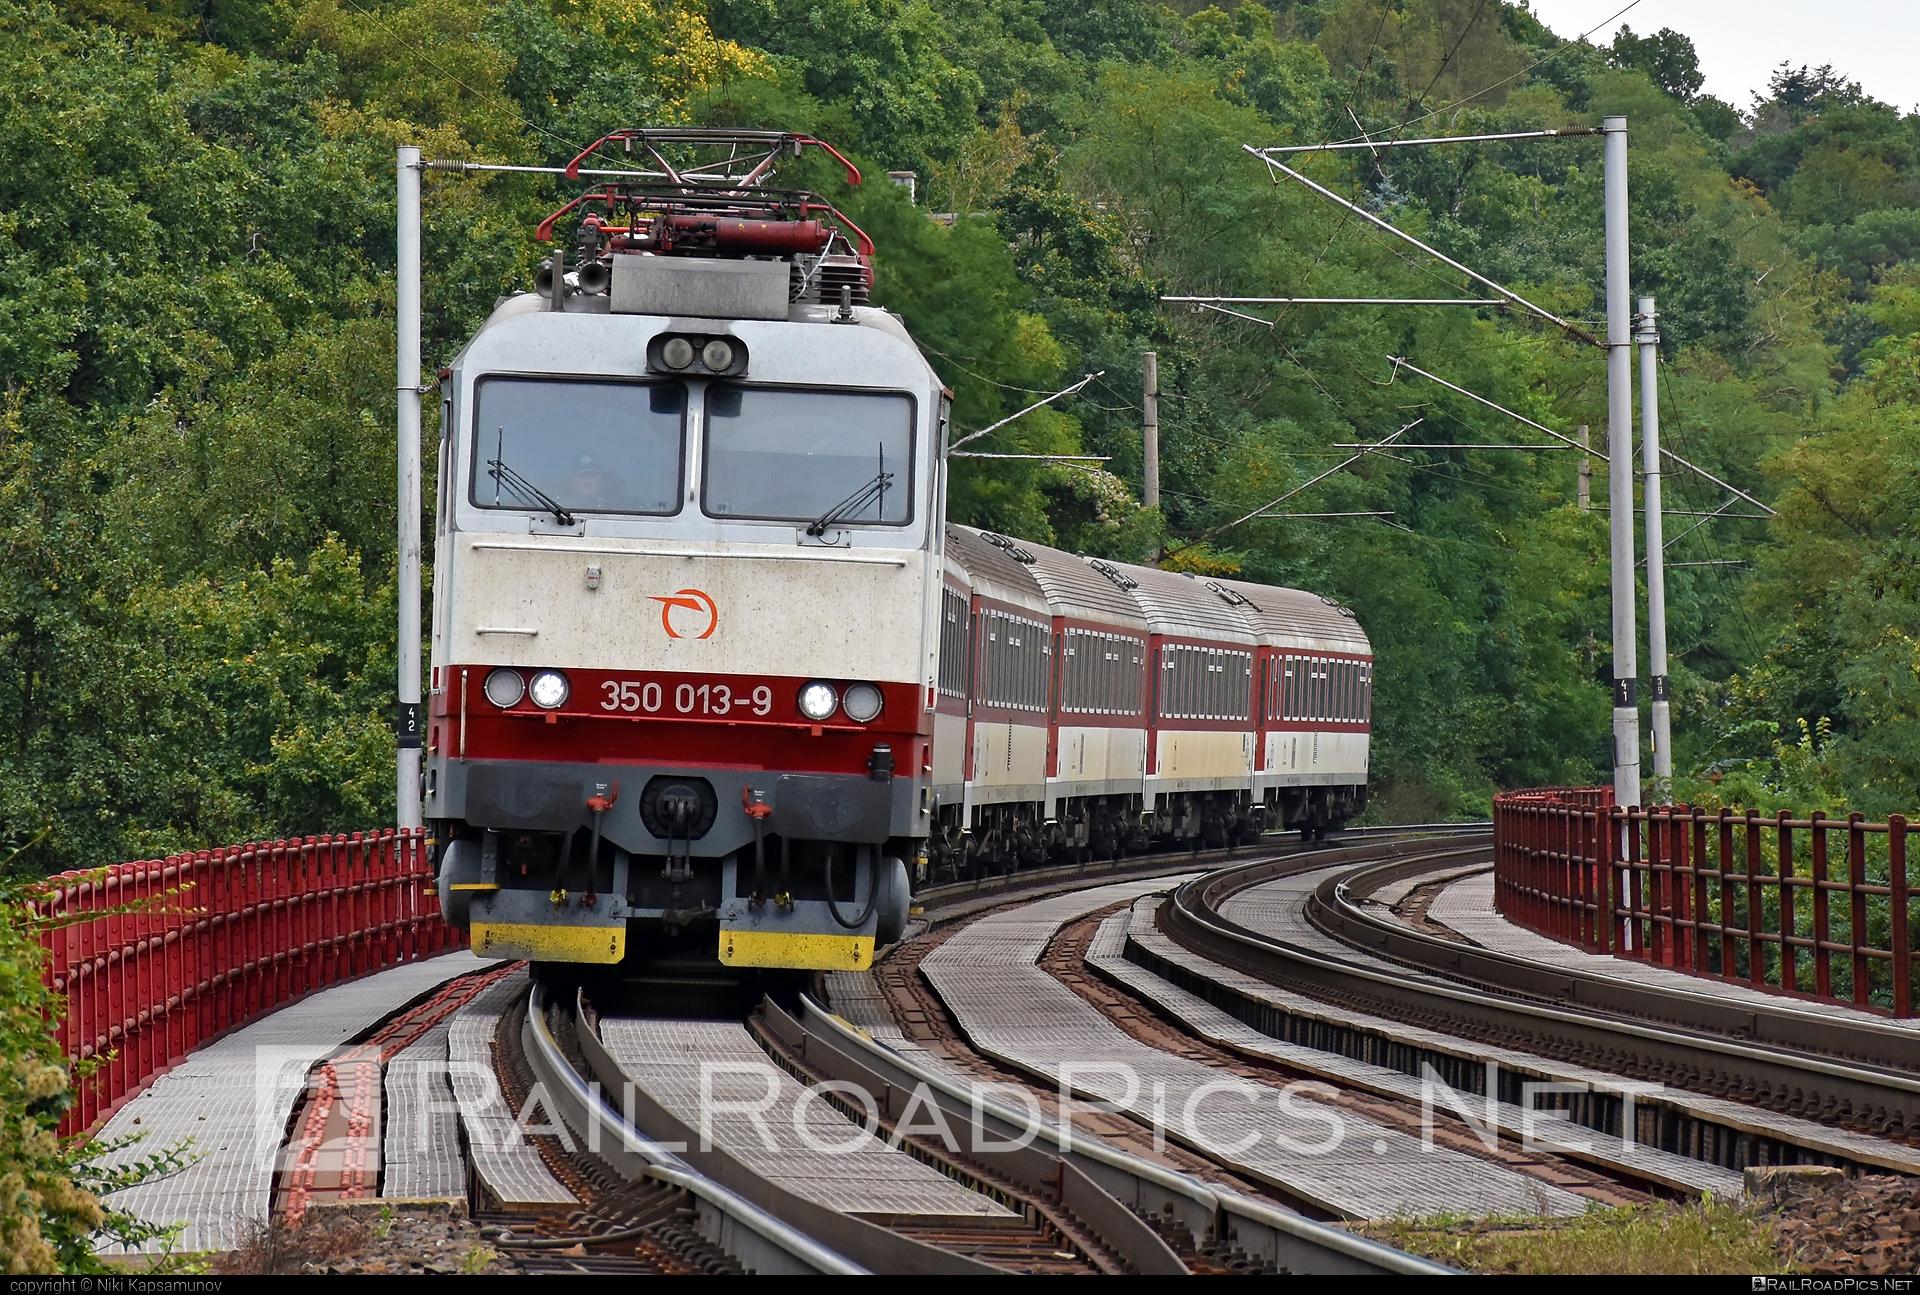 Škoda 55E - 350 013-9 operated by Železničná Spoločnost' Slovensko, a.s. #ZeleznicnaSpolocnostSlovensko #gorila #locomotive350 #skoda #skoda55e #zssk